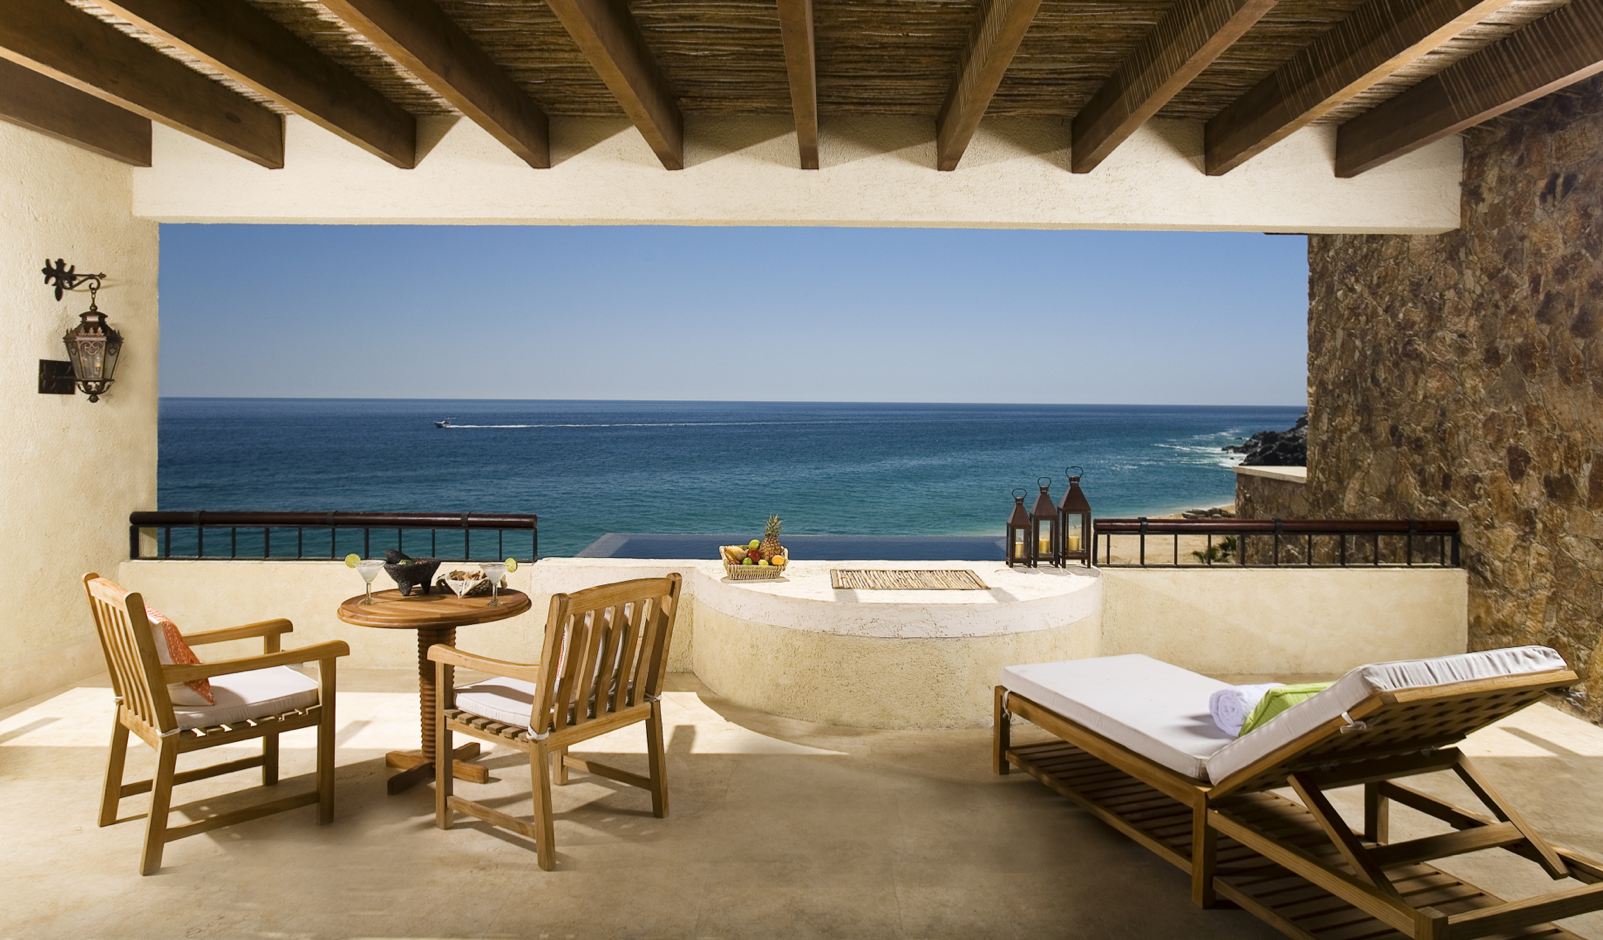 swinger resorts in cabo san lucas